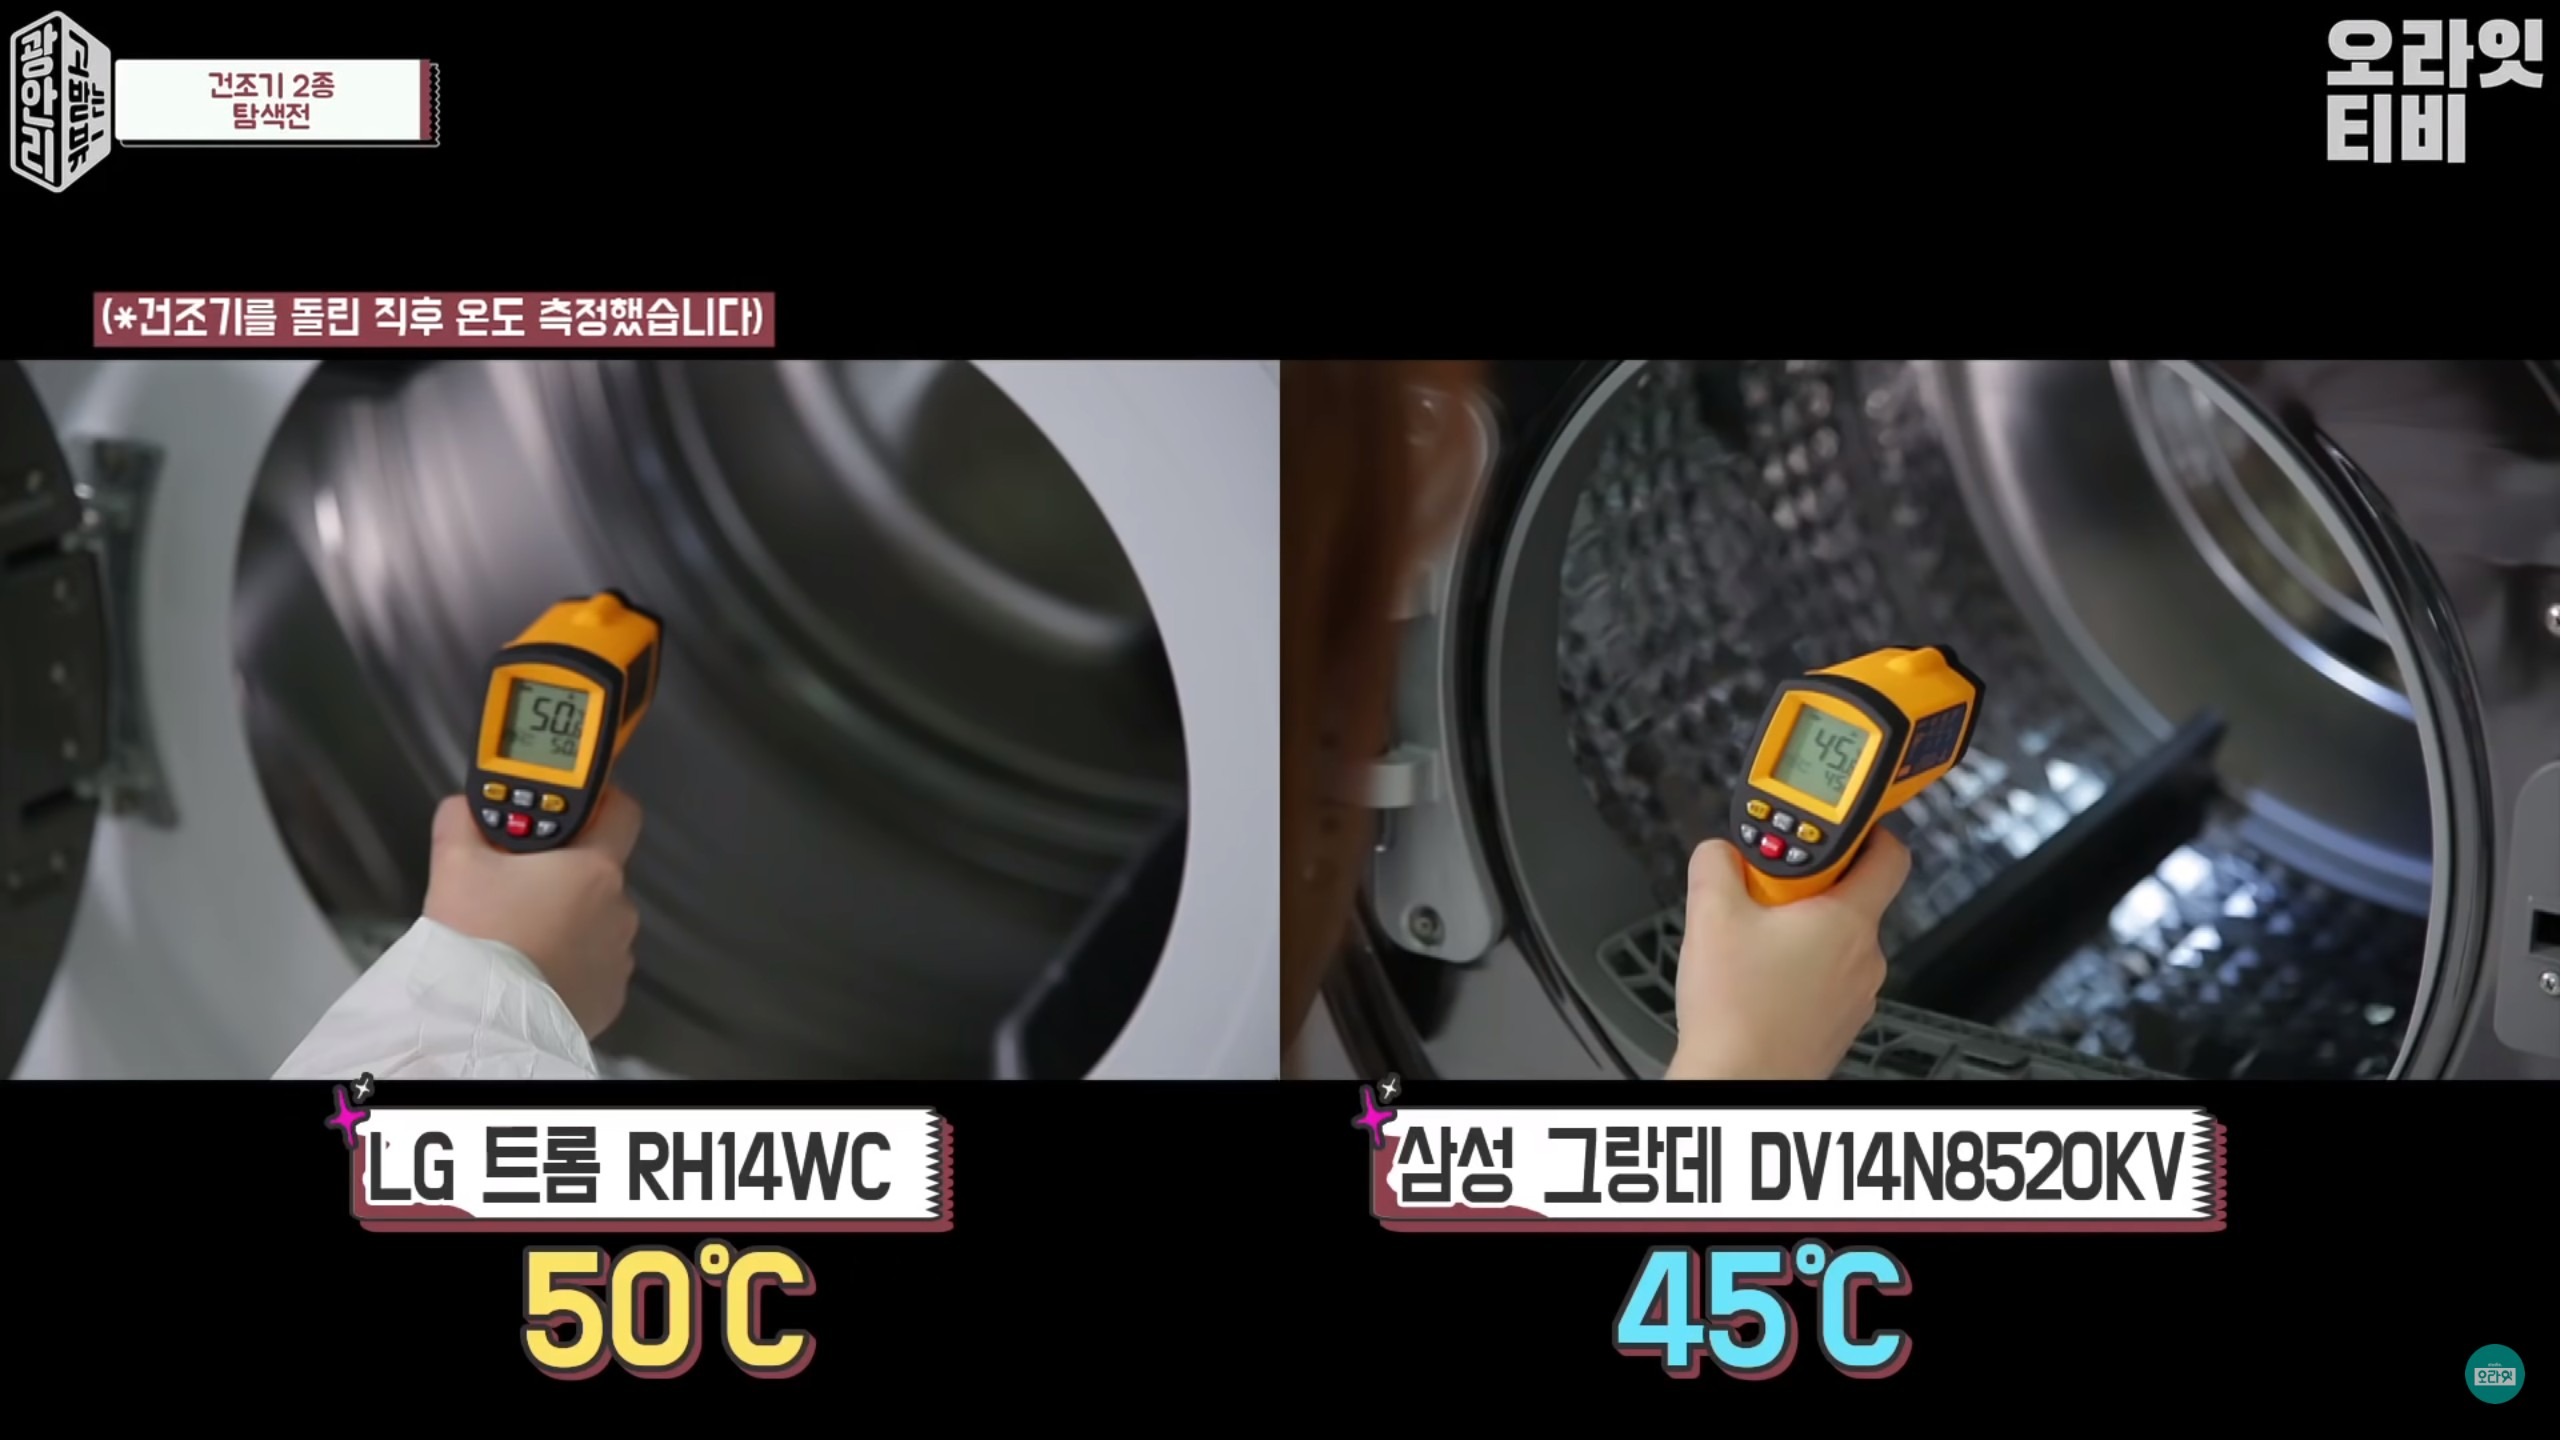 LG跟三星熱泵式乾衣機的烘乾完成後的桶內溫度比較